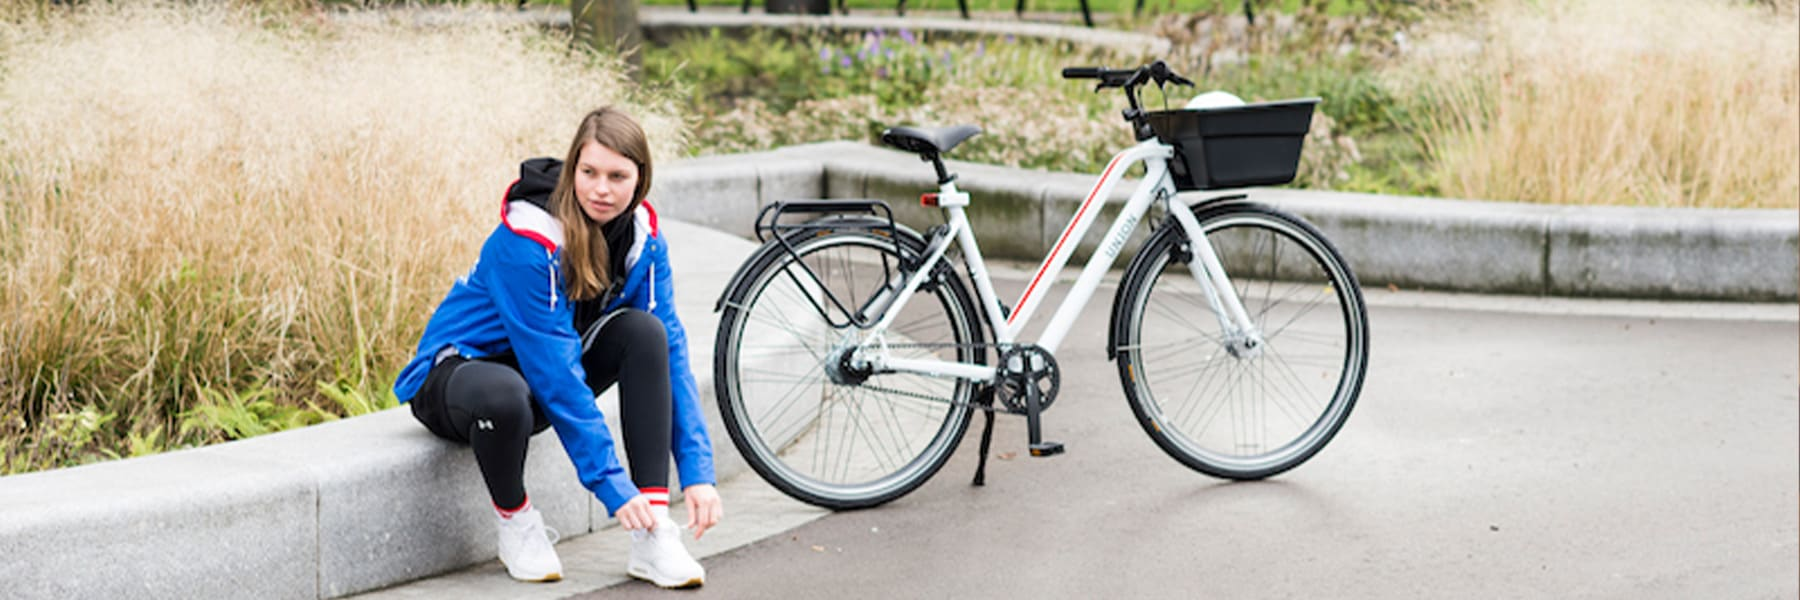 De mooiste fietsroutes van Nederland - Union